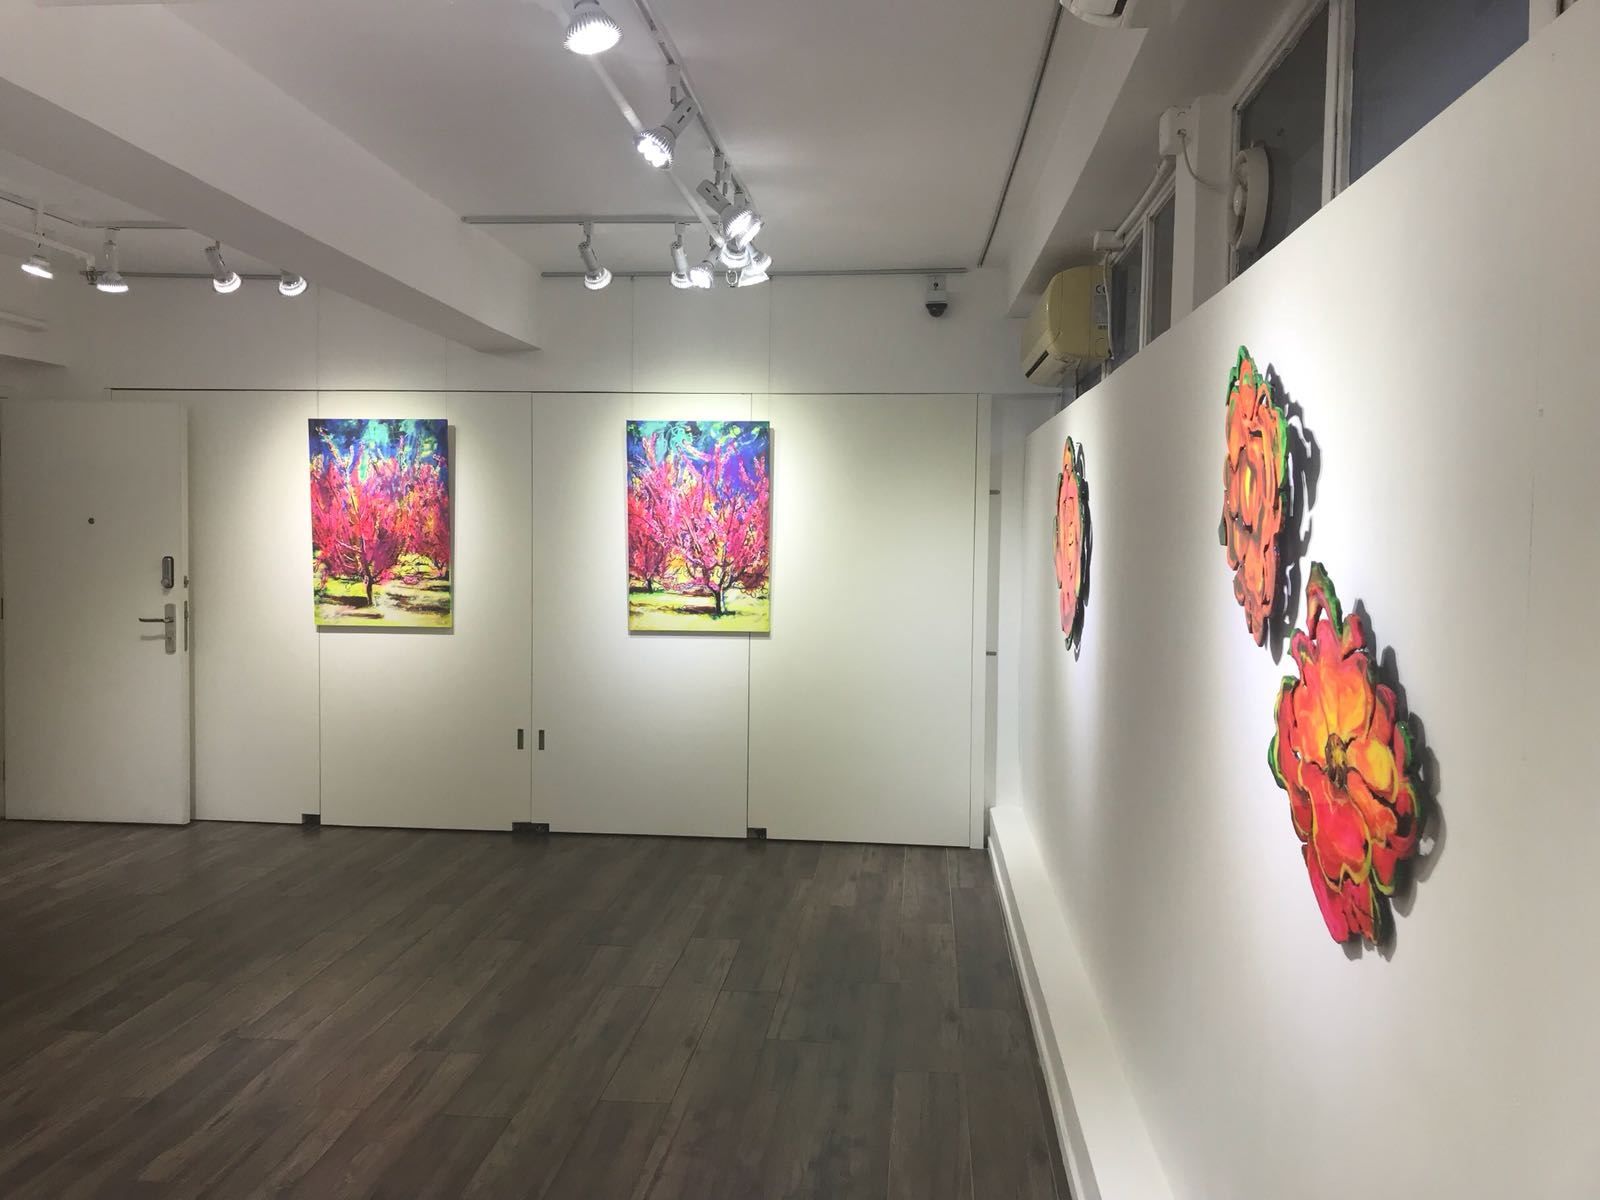 e1b0edaa df2f 427f 9863 dd8b4cee9129 Solo Exhibition Hong Kong Galería Koo.